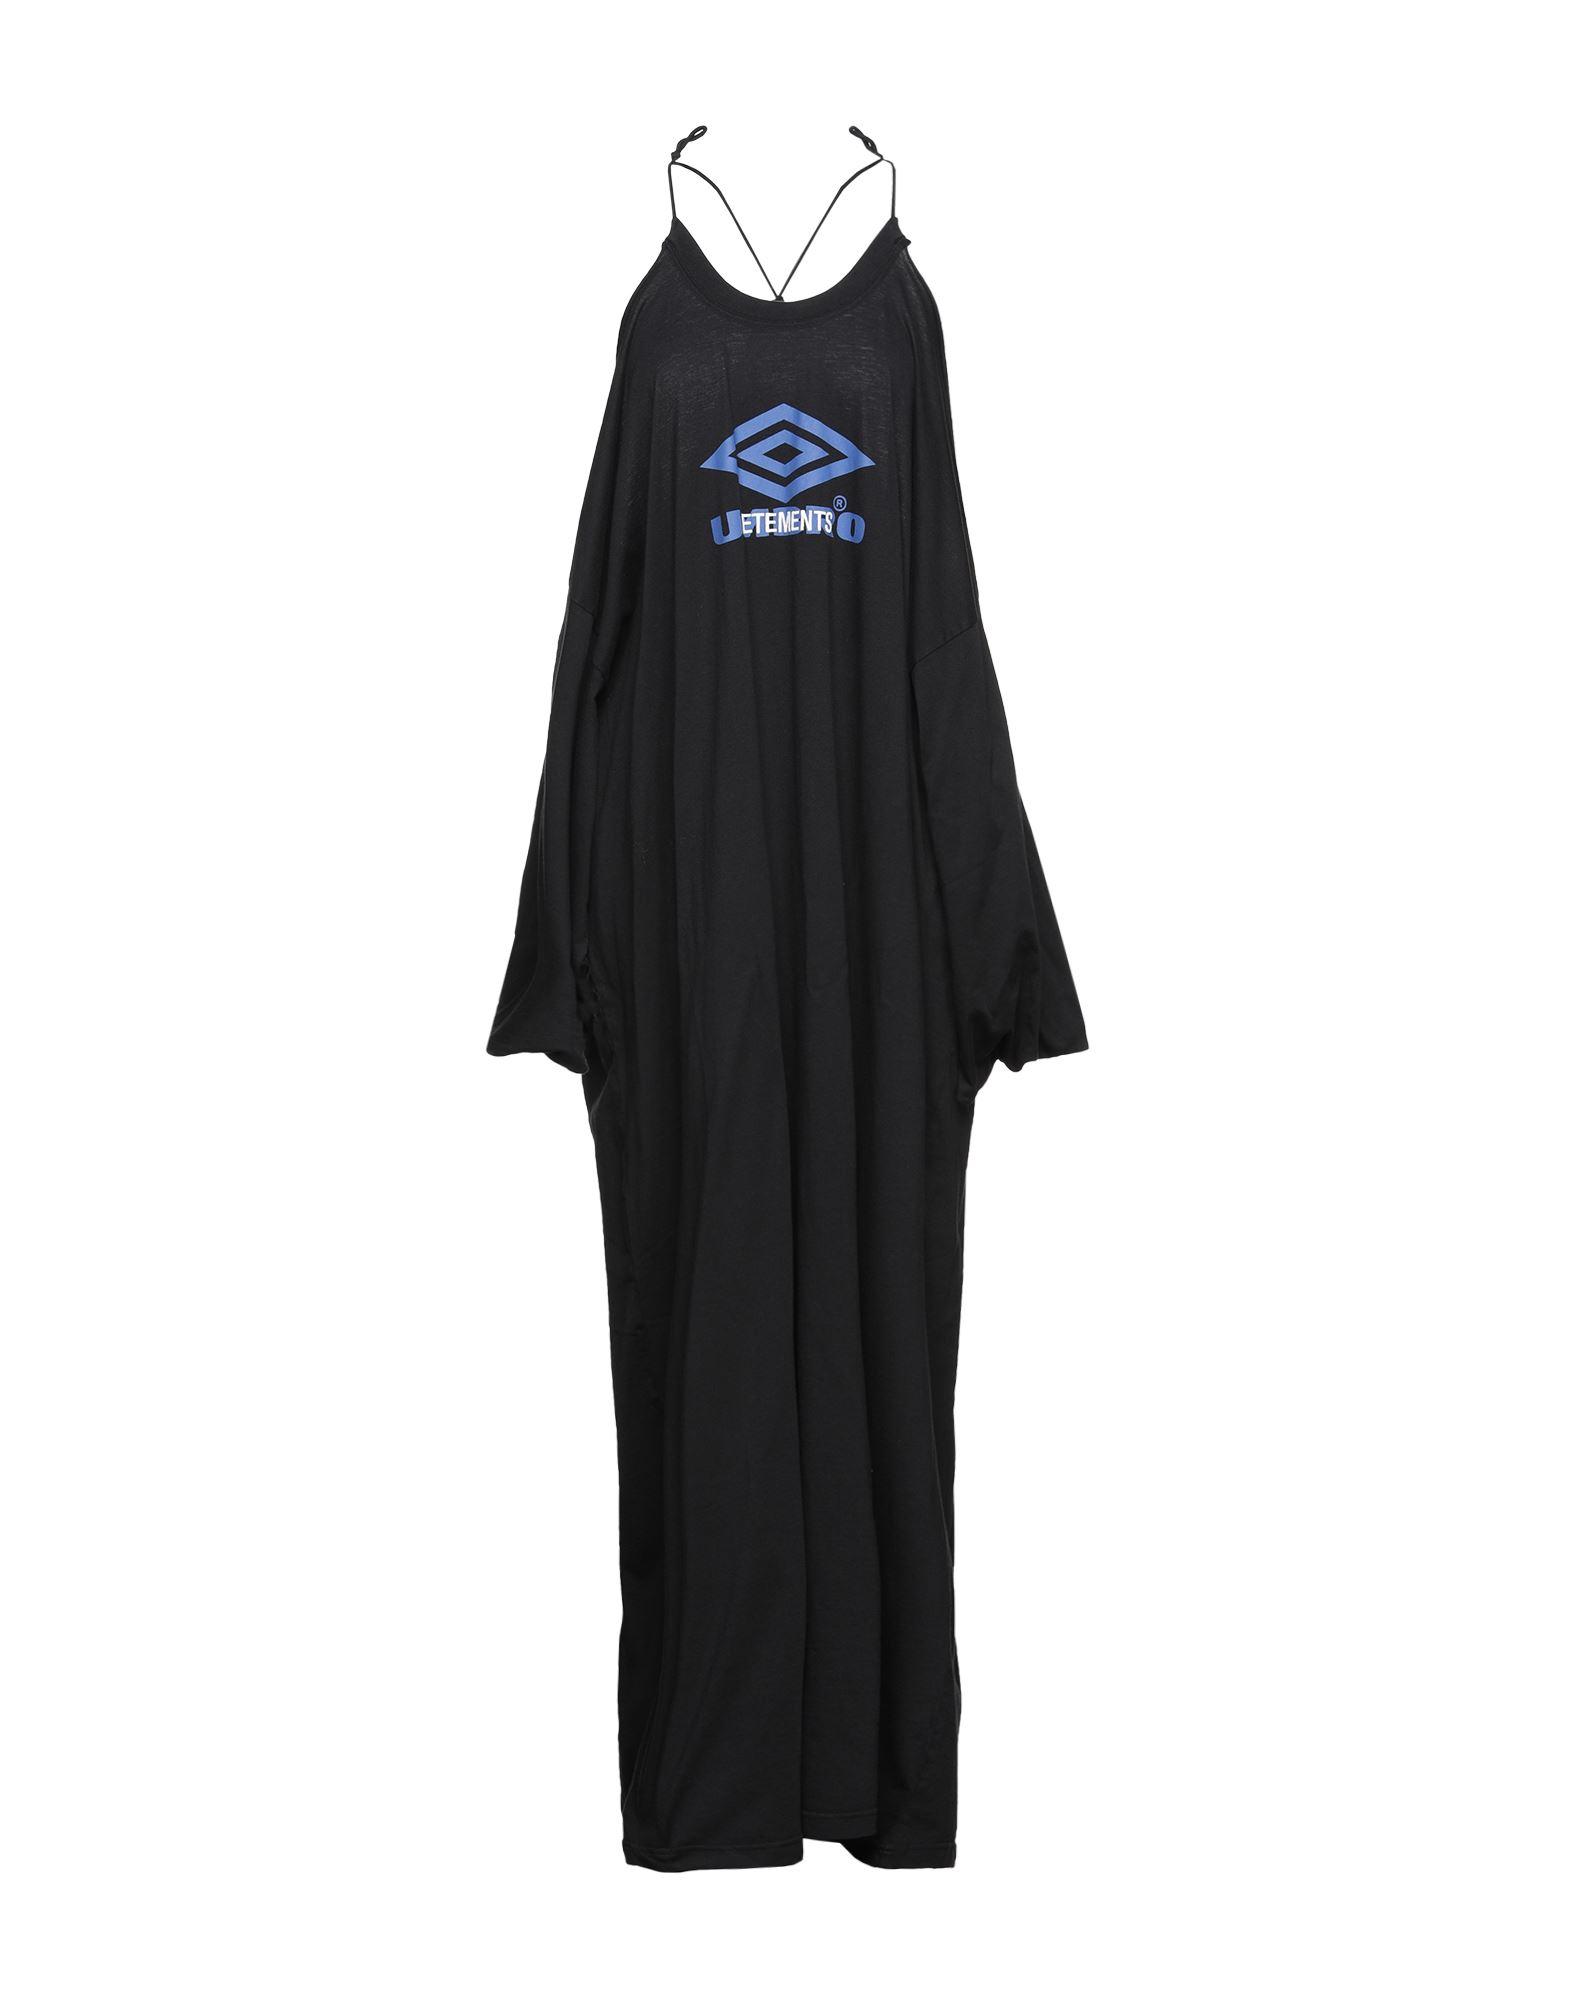 VETEMENTS x UMBRO Длинное платье